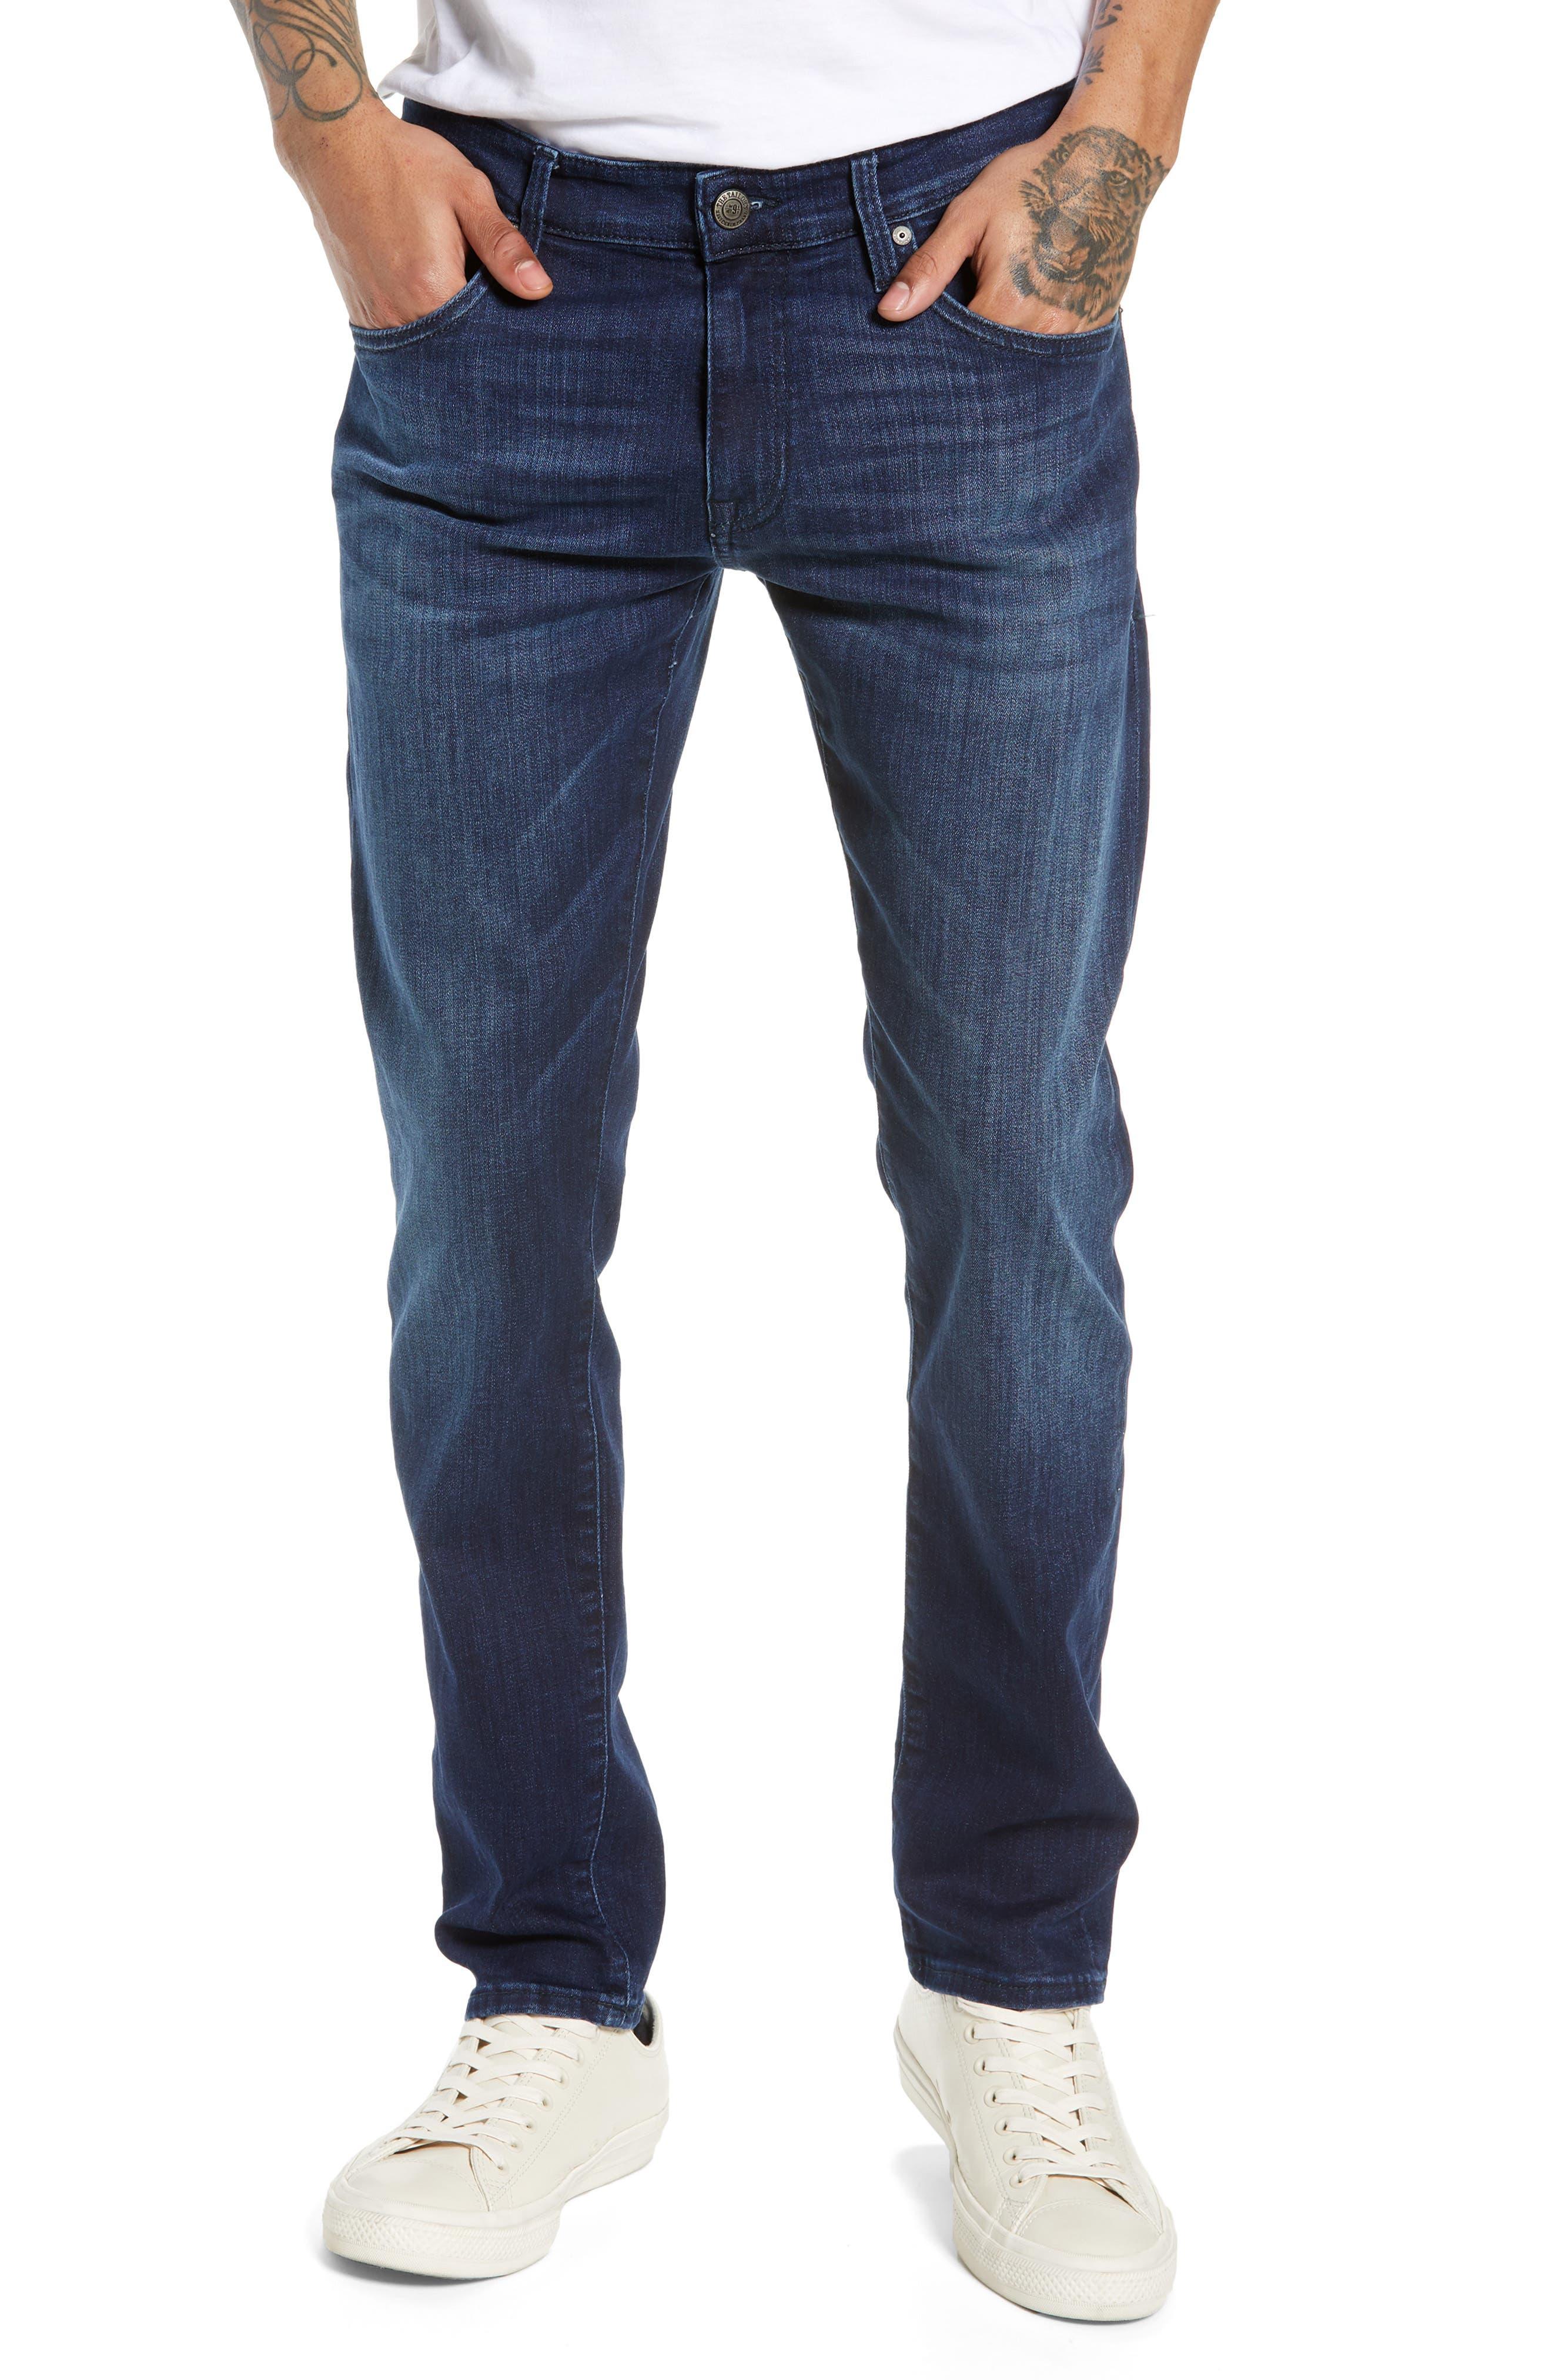 MAVI JEANS, Jake Slim Fit Jeans, Main thumbnail 1, color, DARK TONAL WILLIAMSBURG